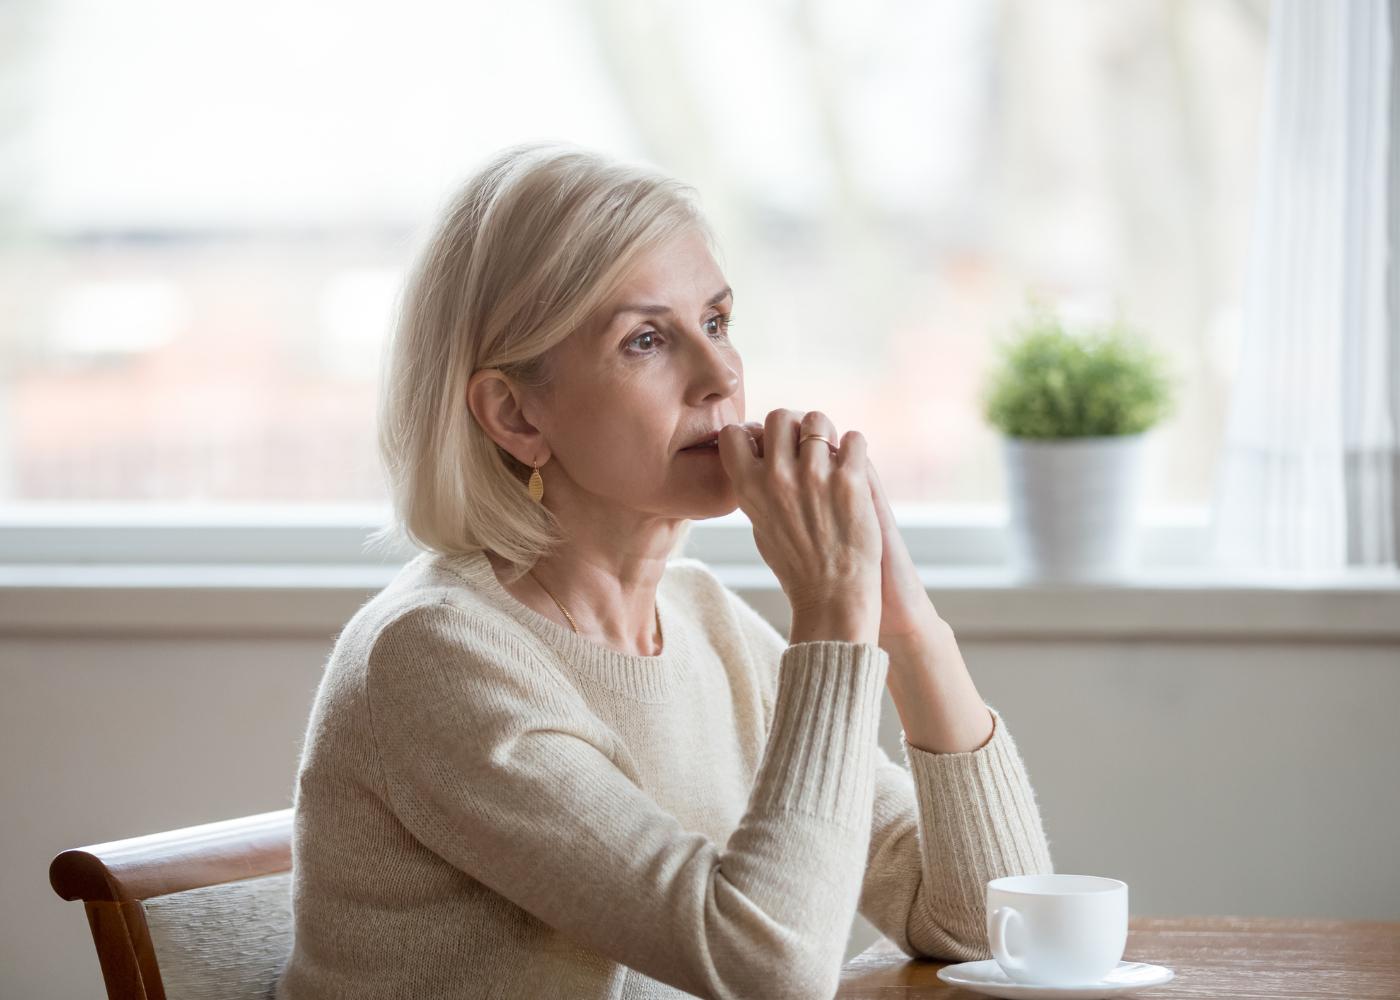 menopausa como se manifesta